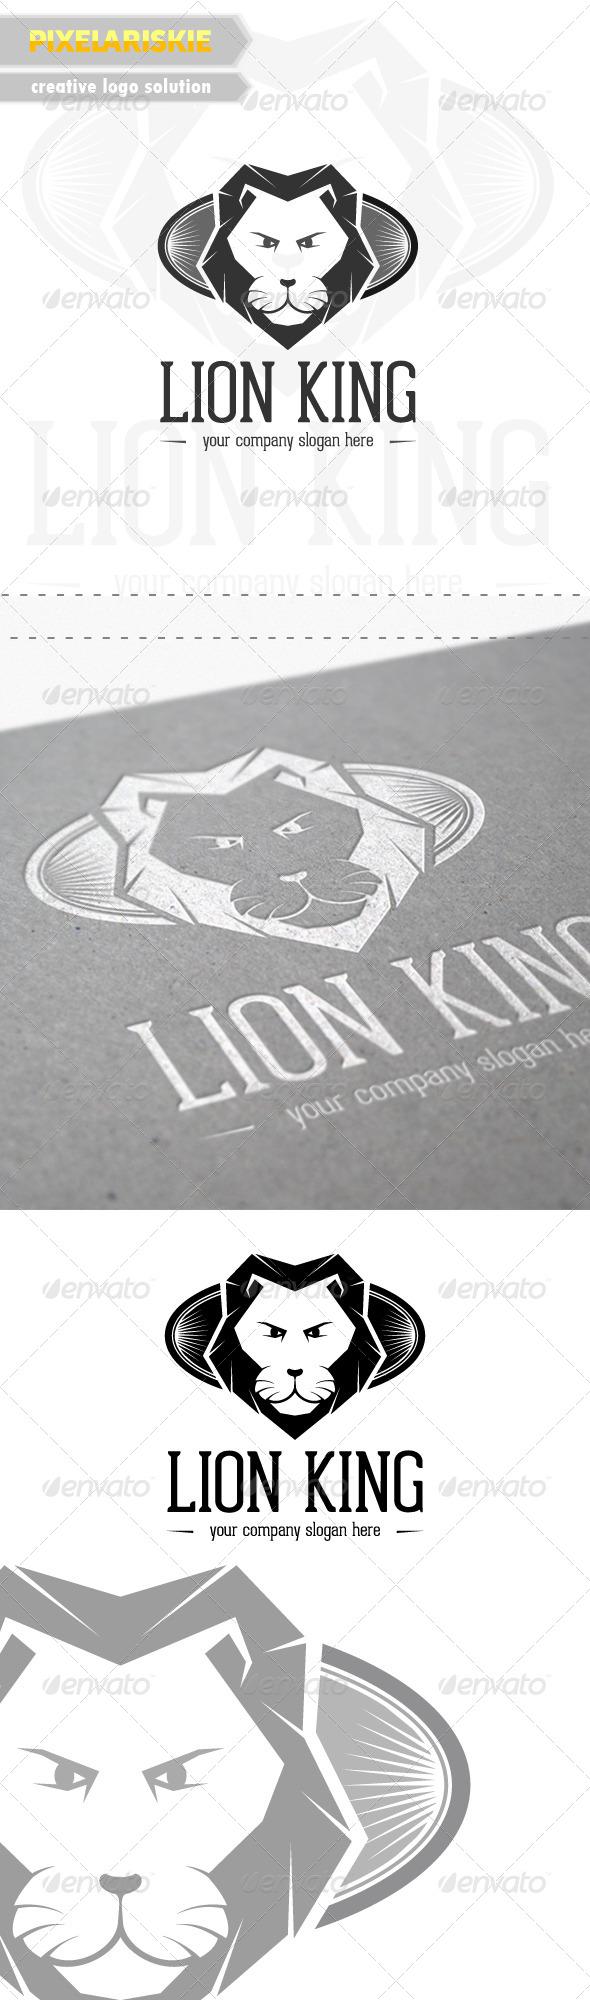 GraphicRiver Lion King Logo 6450880